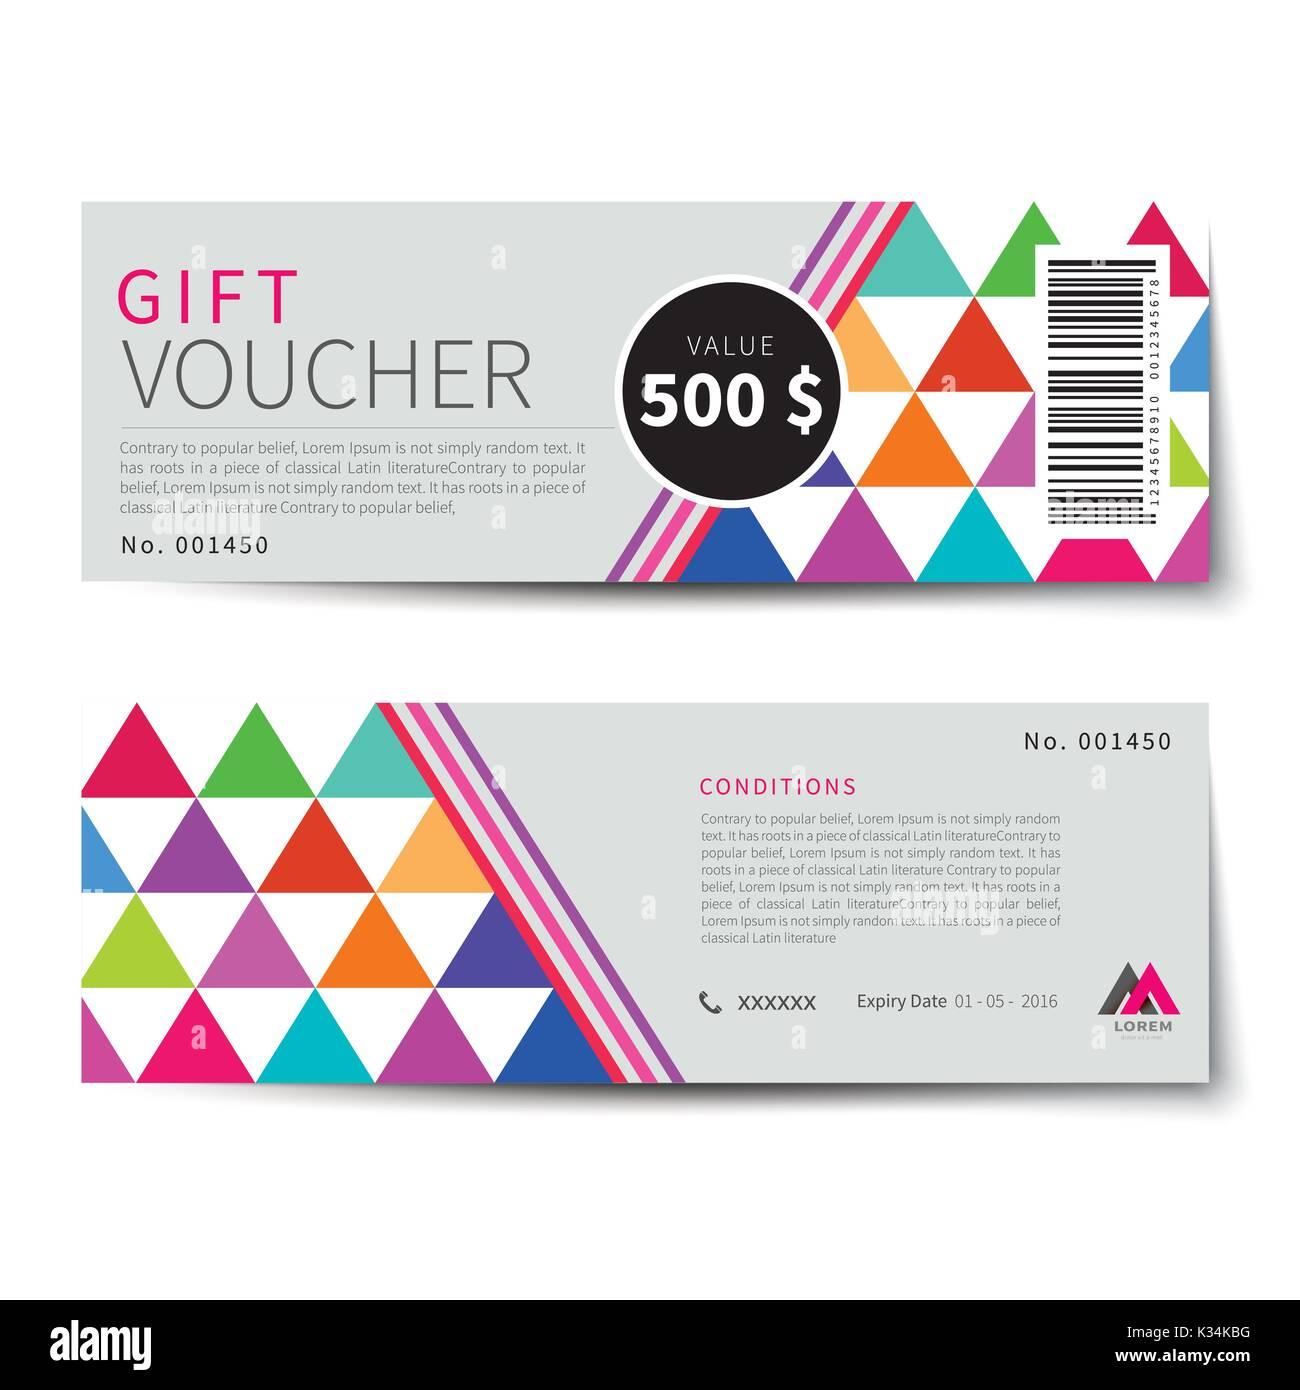 Gift Voucher Border Stock Photos & Gift Voucher Border